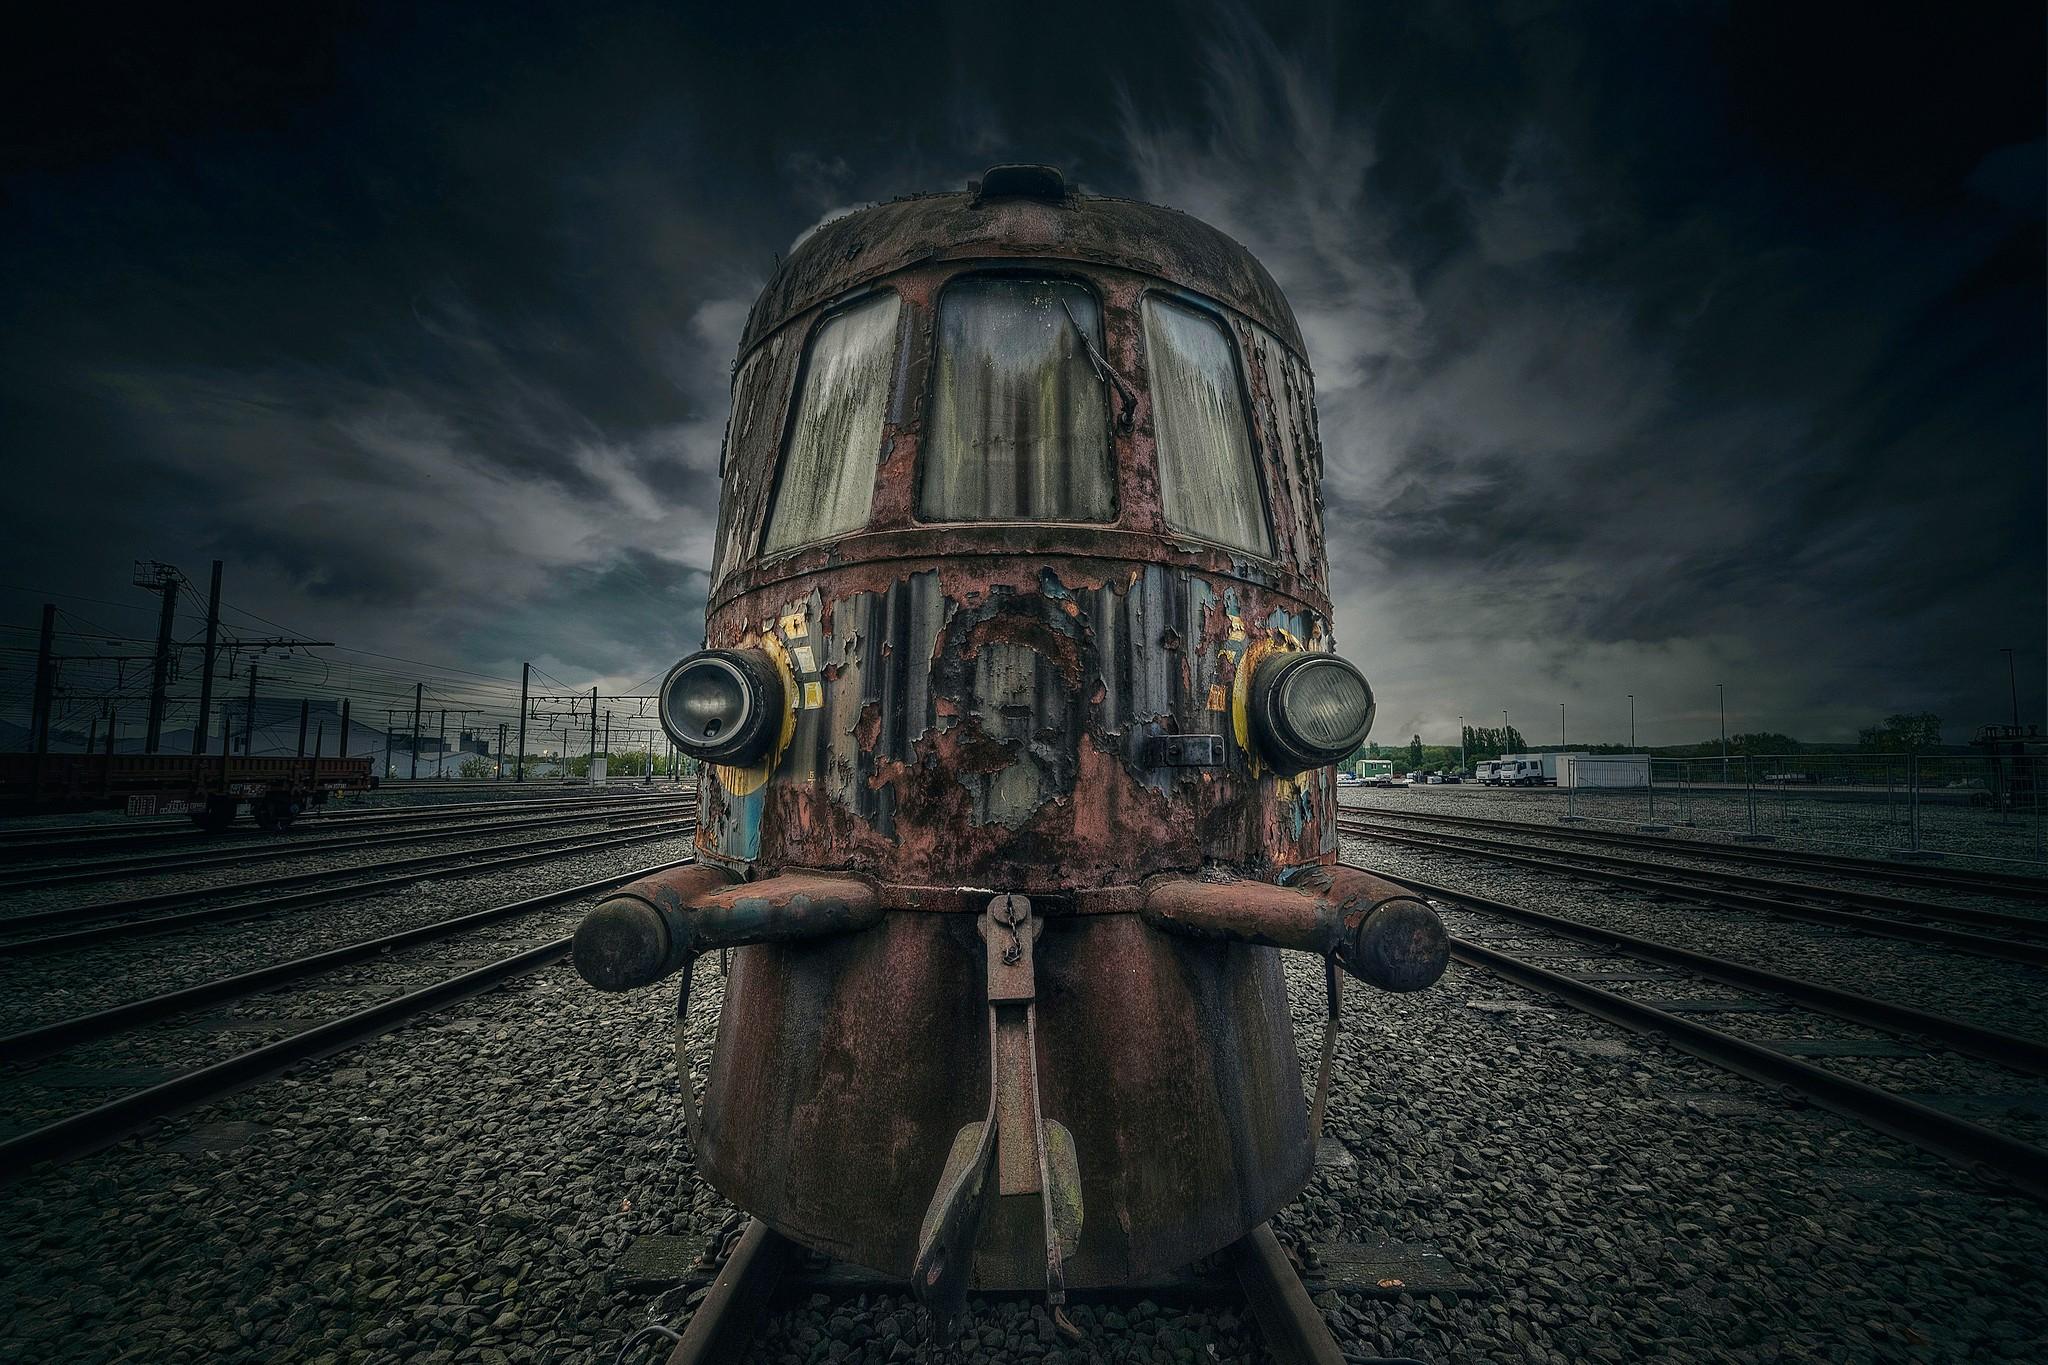 General 2048x1365 train vehicle old railway railroad track locomotive